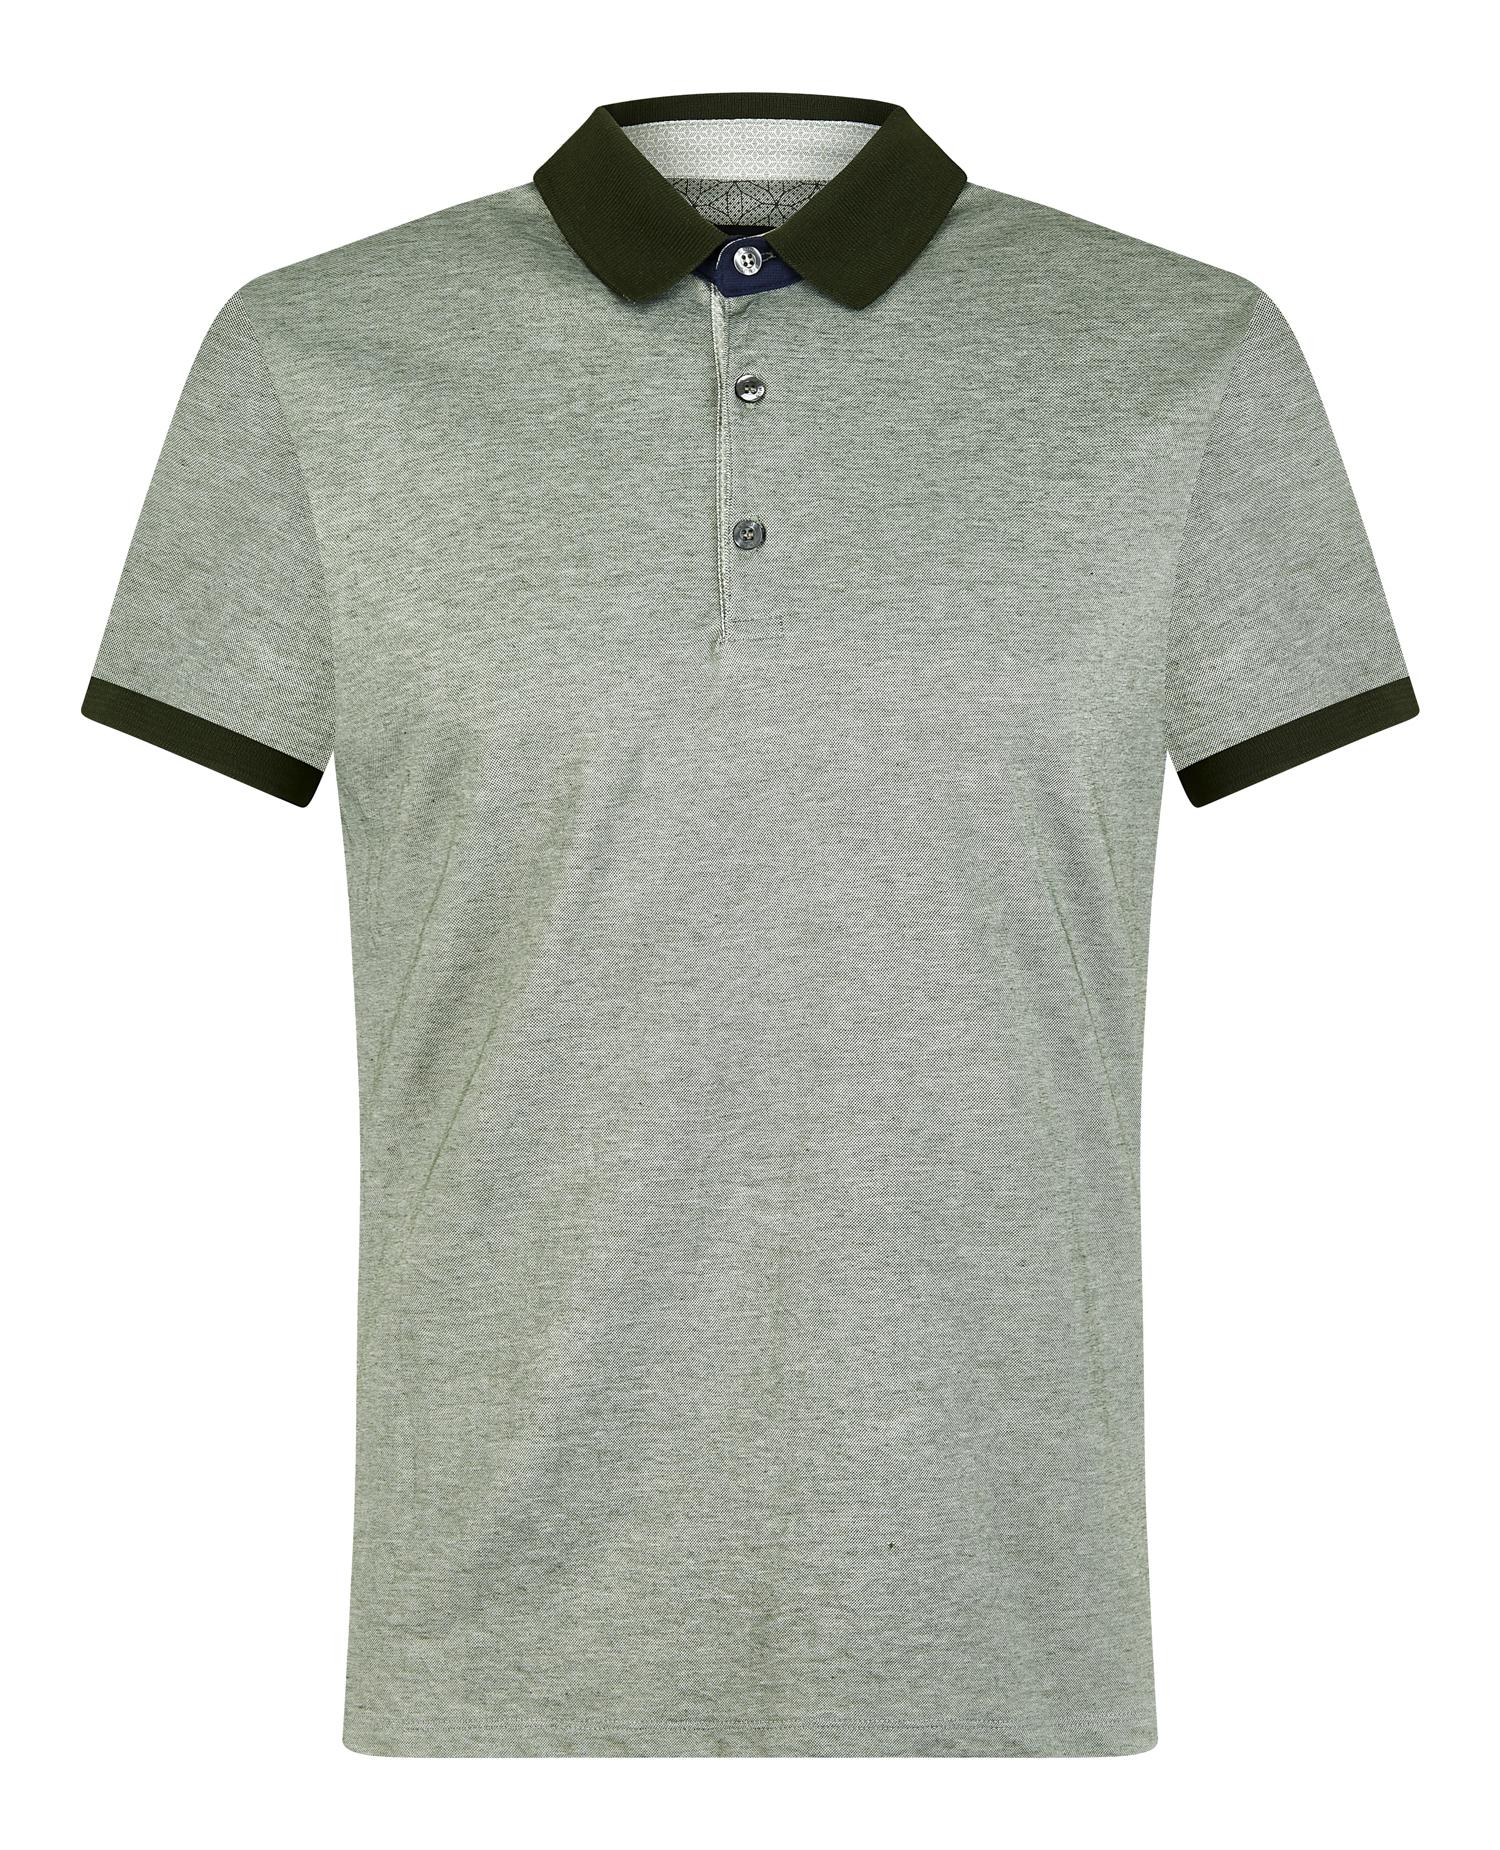 Wholesale Contrast Collar Polo Shirts Bcd Tofu House